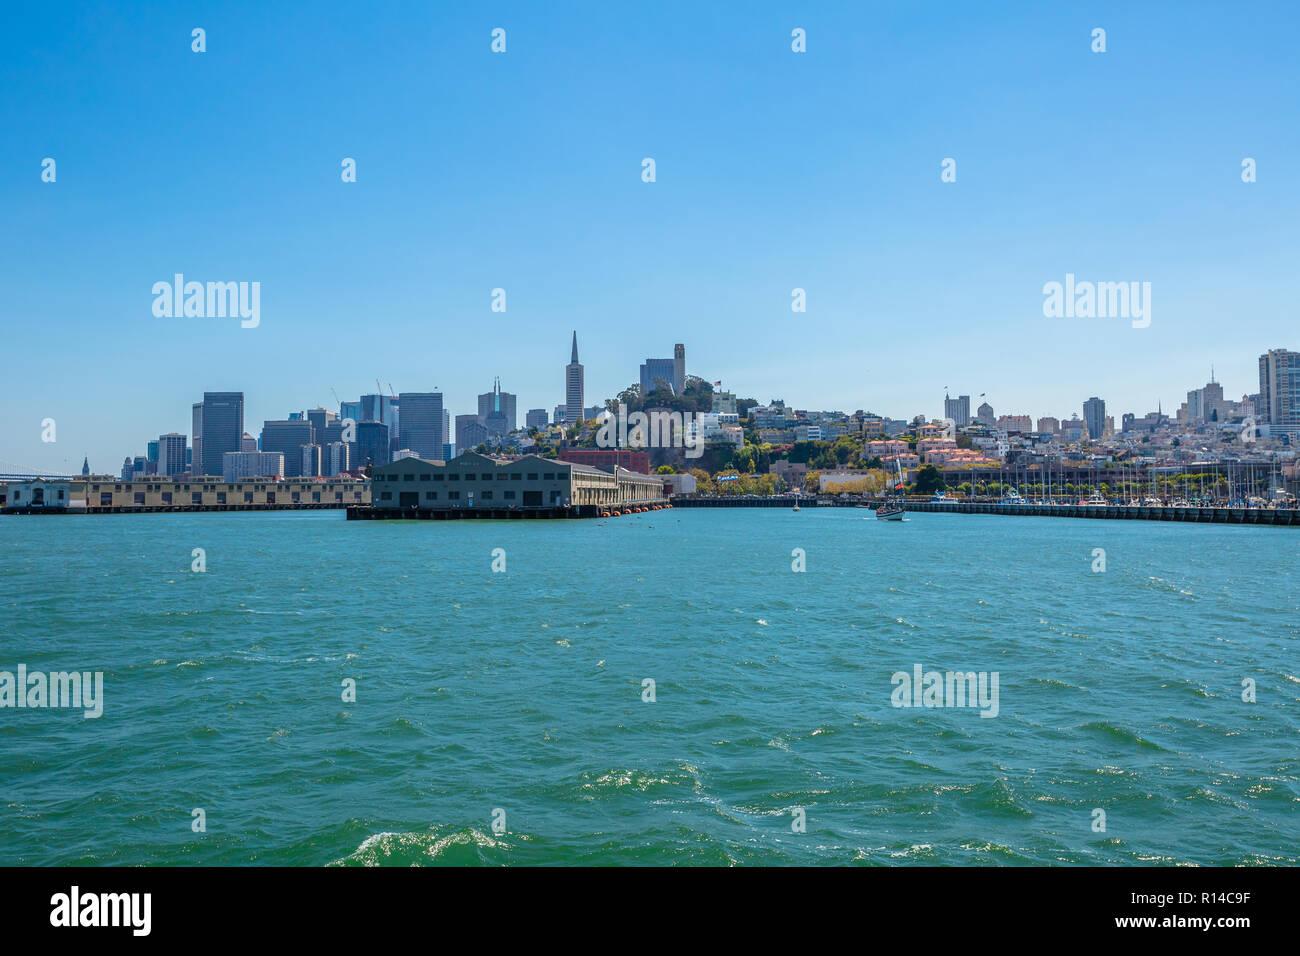 San Francisco, California, United States - August 14, 2016: Alcatraz boat tour to Alcatraz island in San Francisco pier 33, California in the United States. - Stock Image